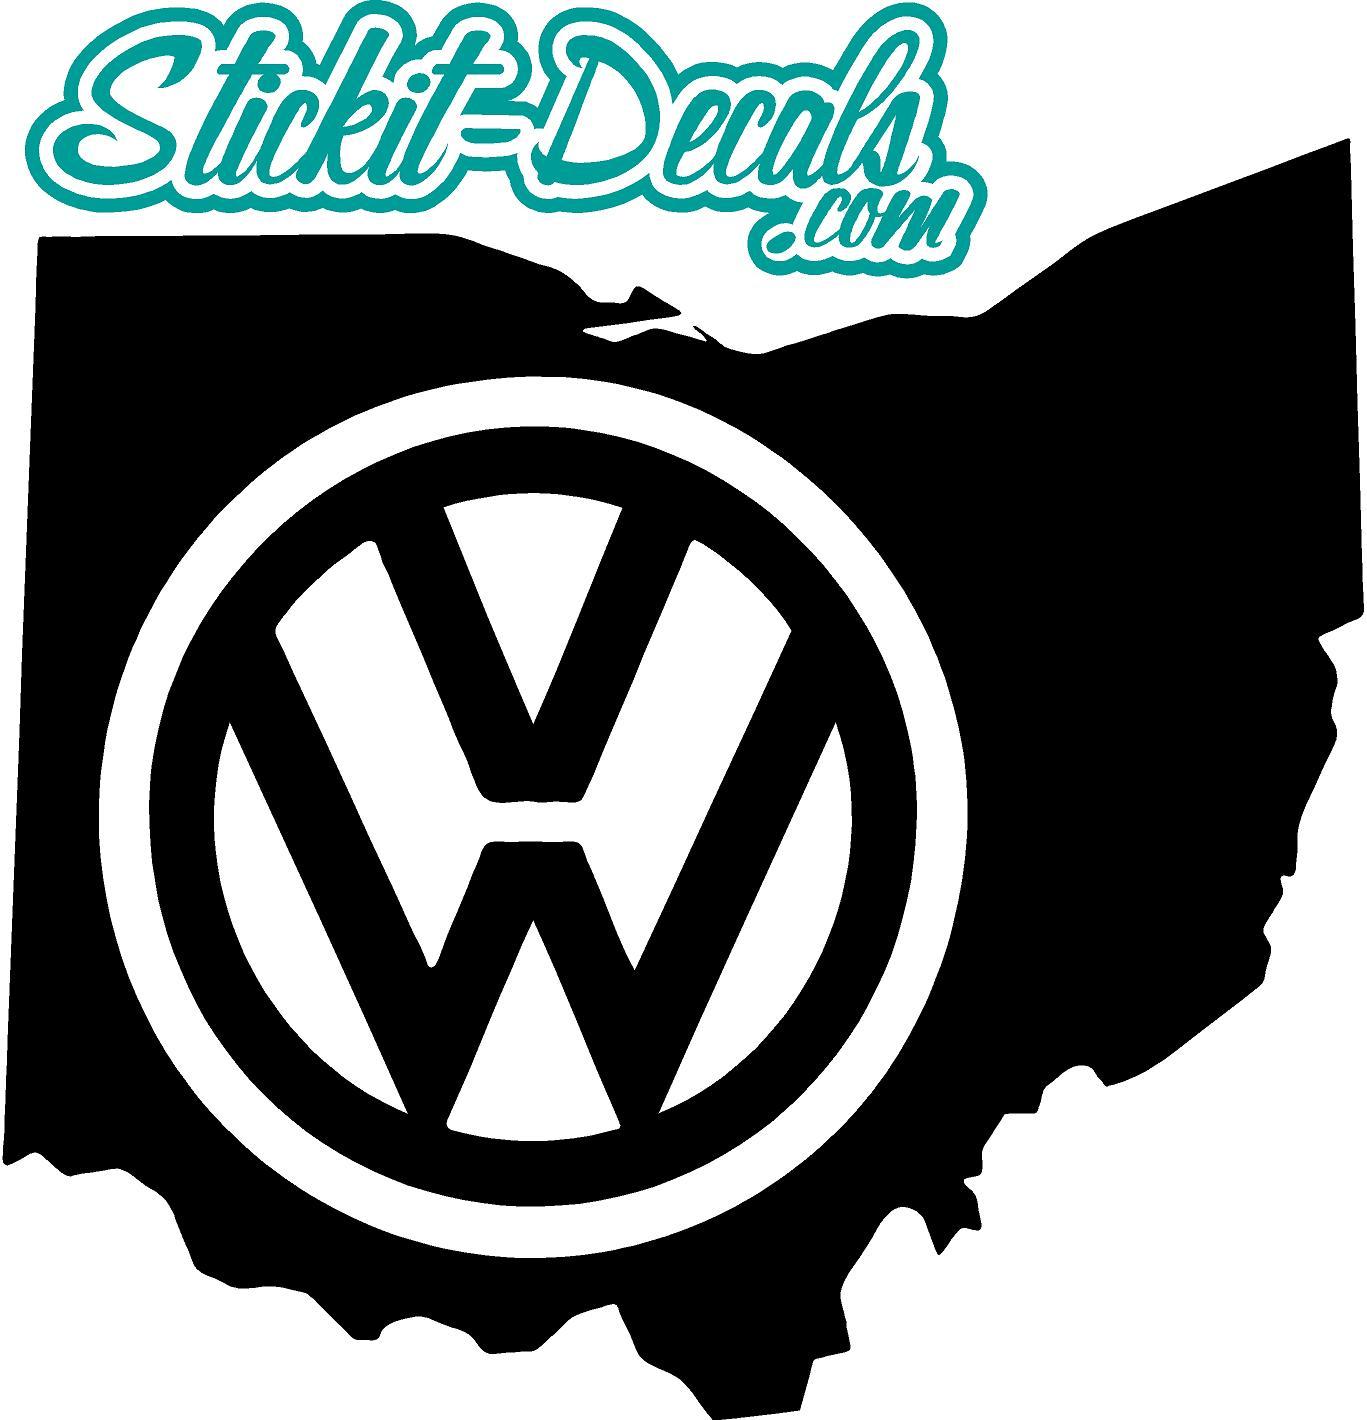 1367x1420 Ohio Silhouette Car Logos Volkswagen, Vw, Audi, Acura, Honda